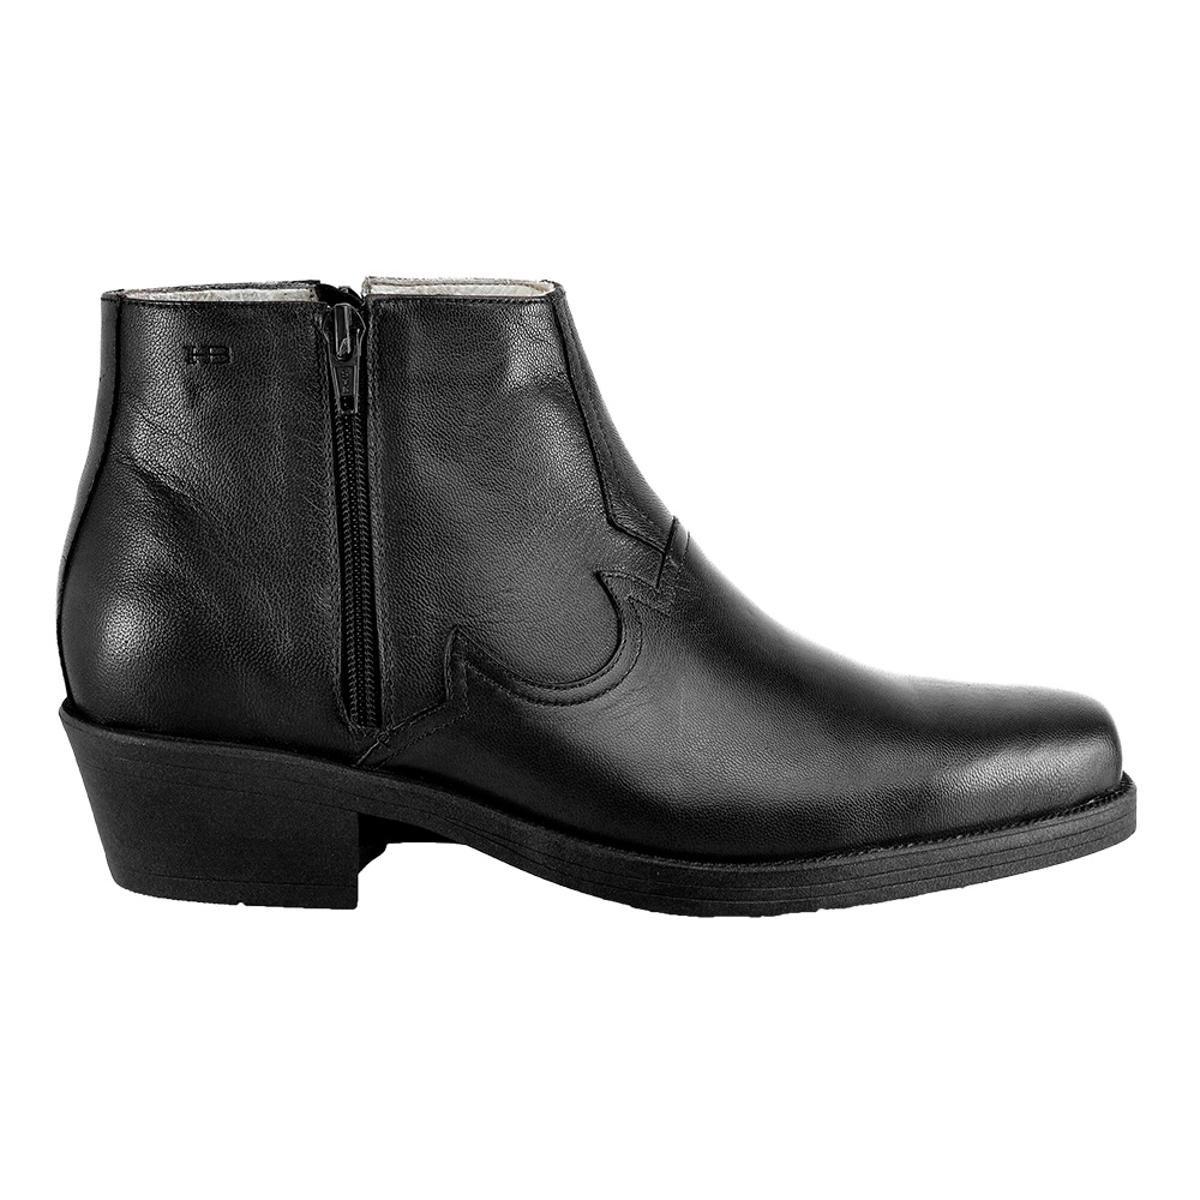 2976570455 Bota Hb Agabe Boots Conforto Masculina - Preto